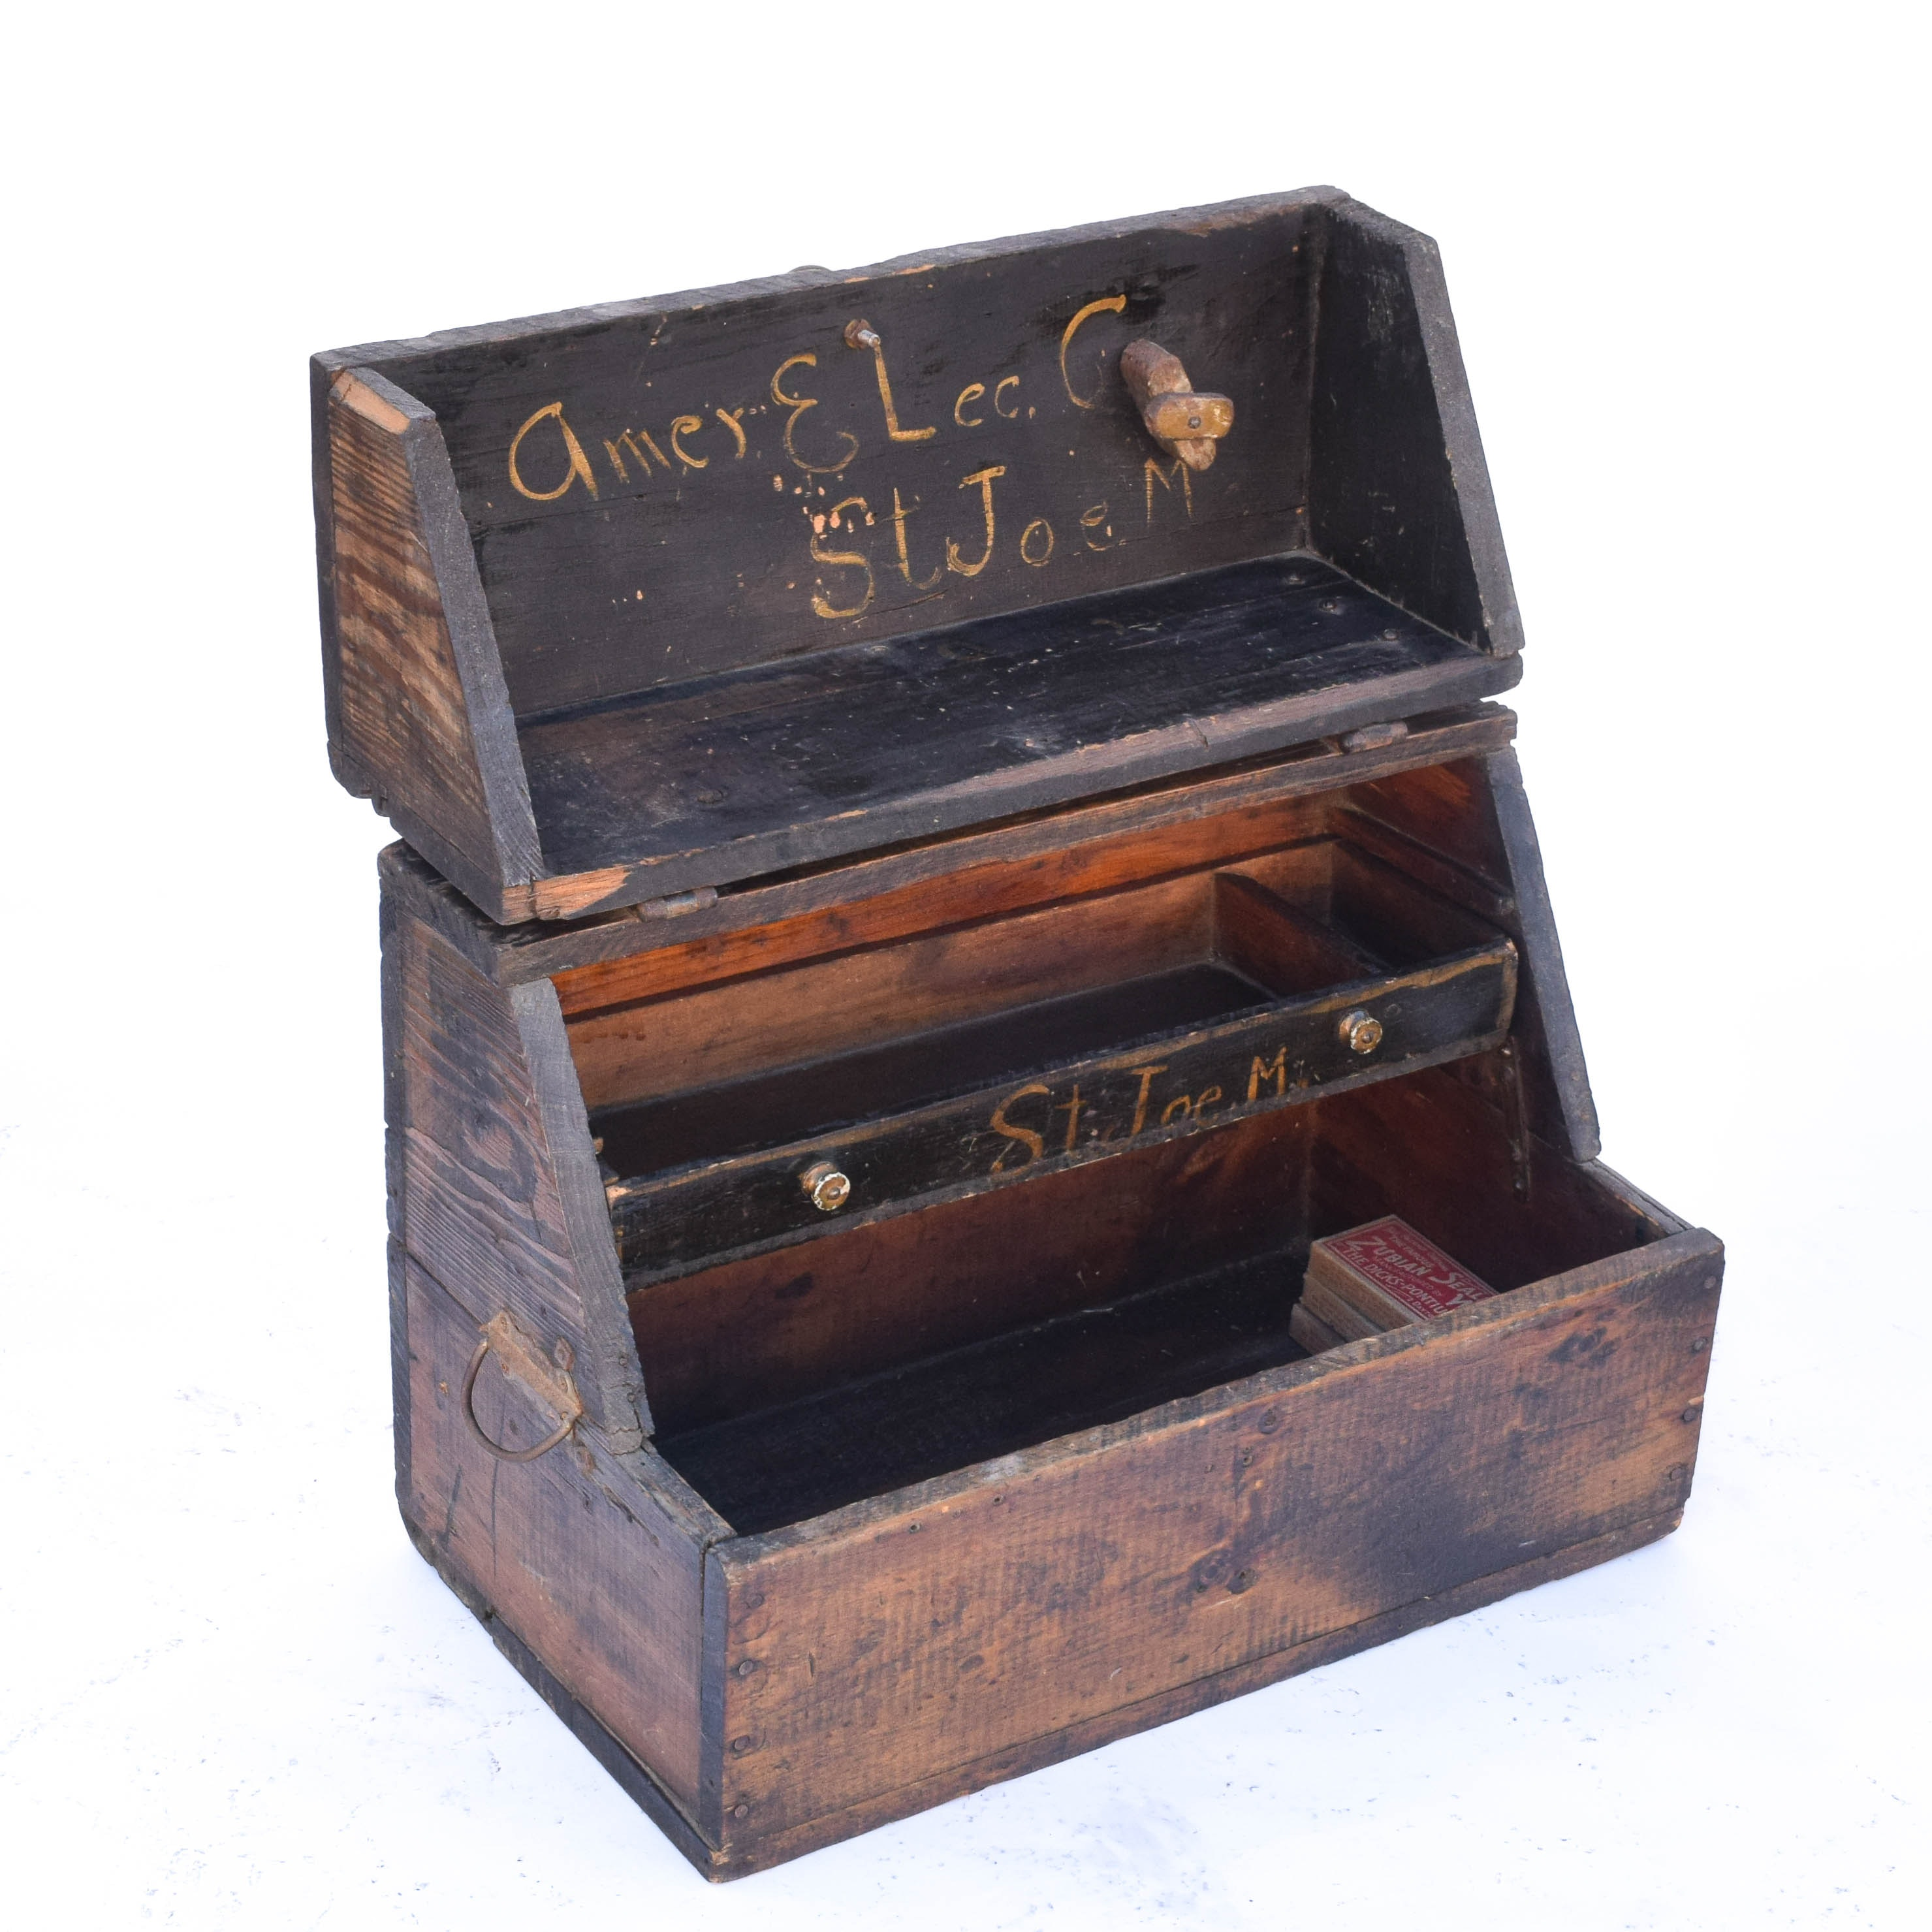 Antique Tool or Shoeshine Box